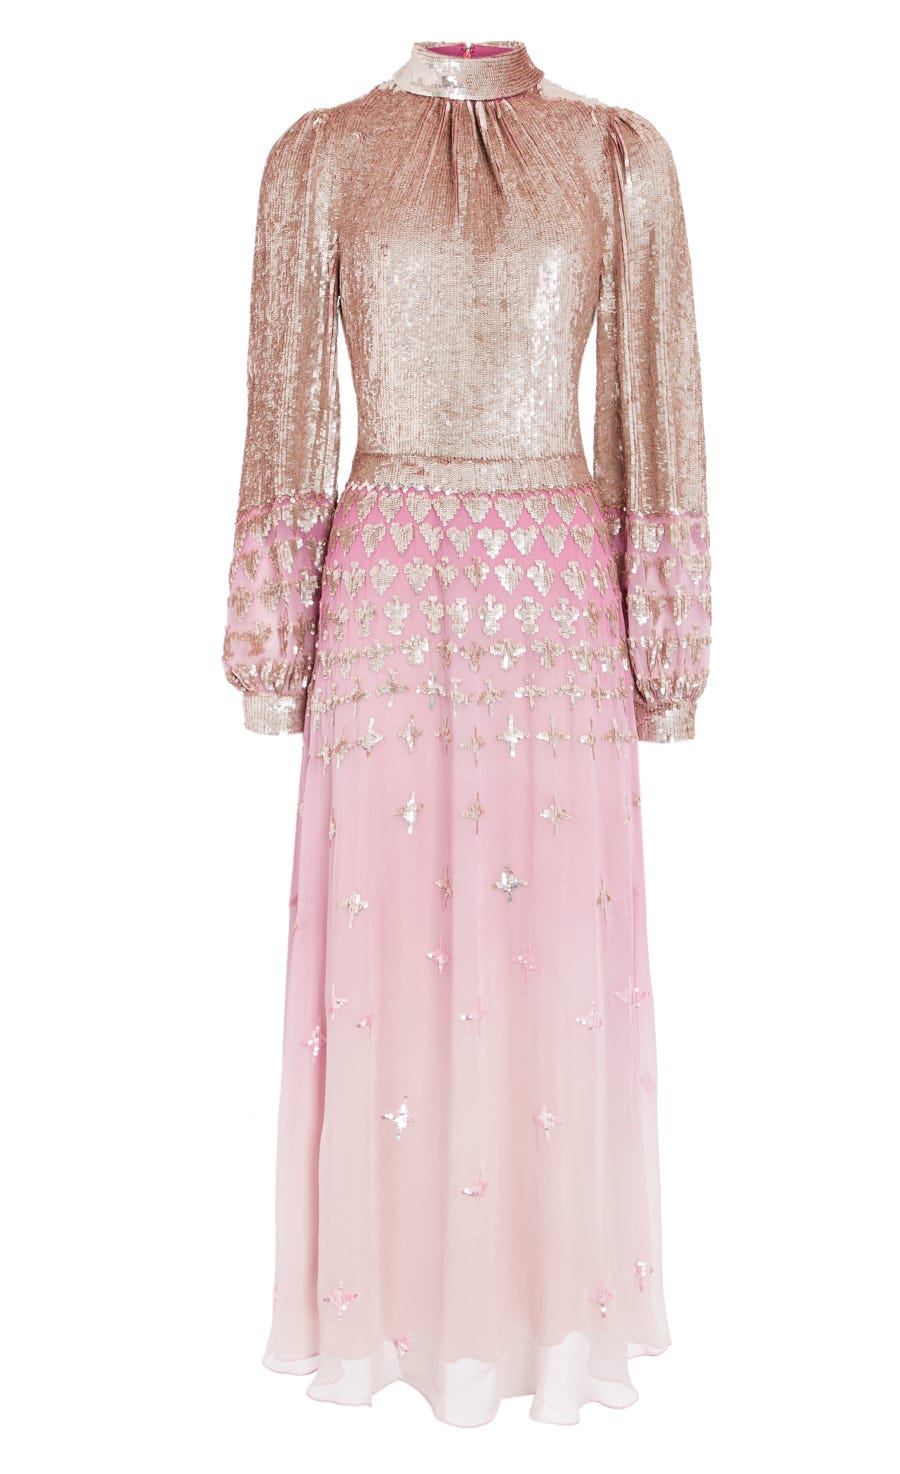 Mirela Cocktail Dress